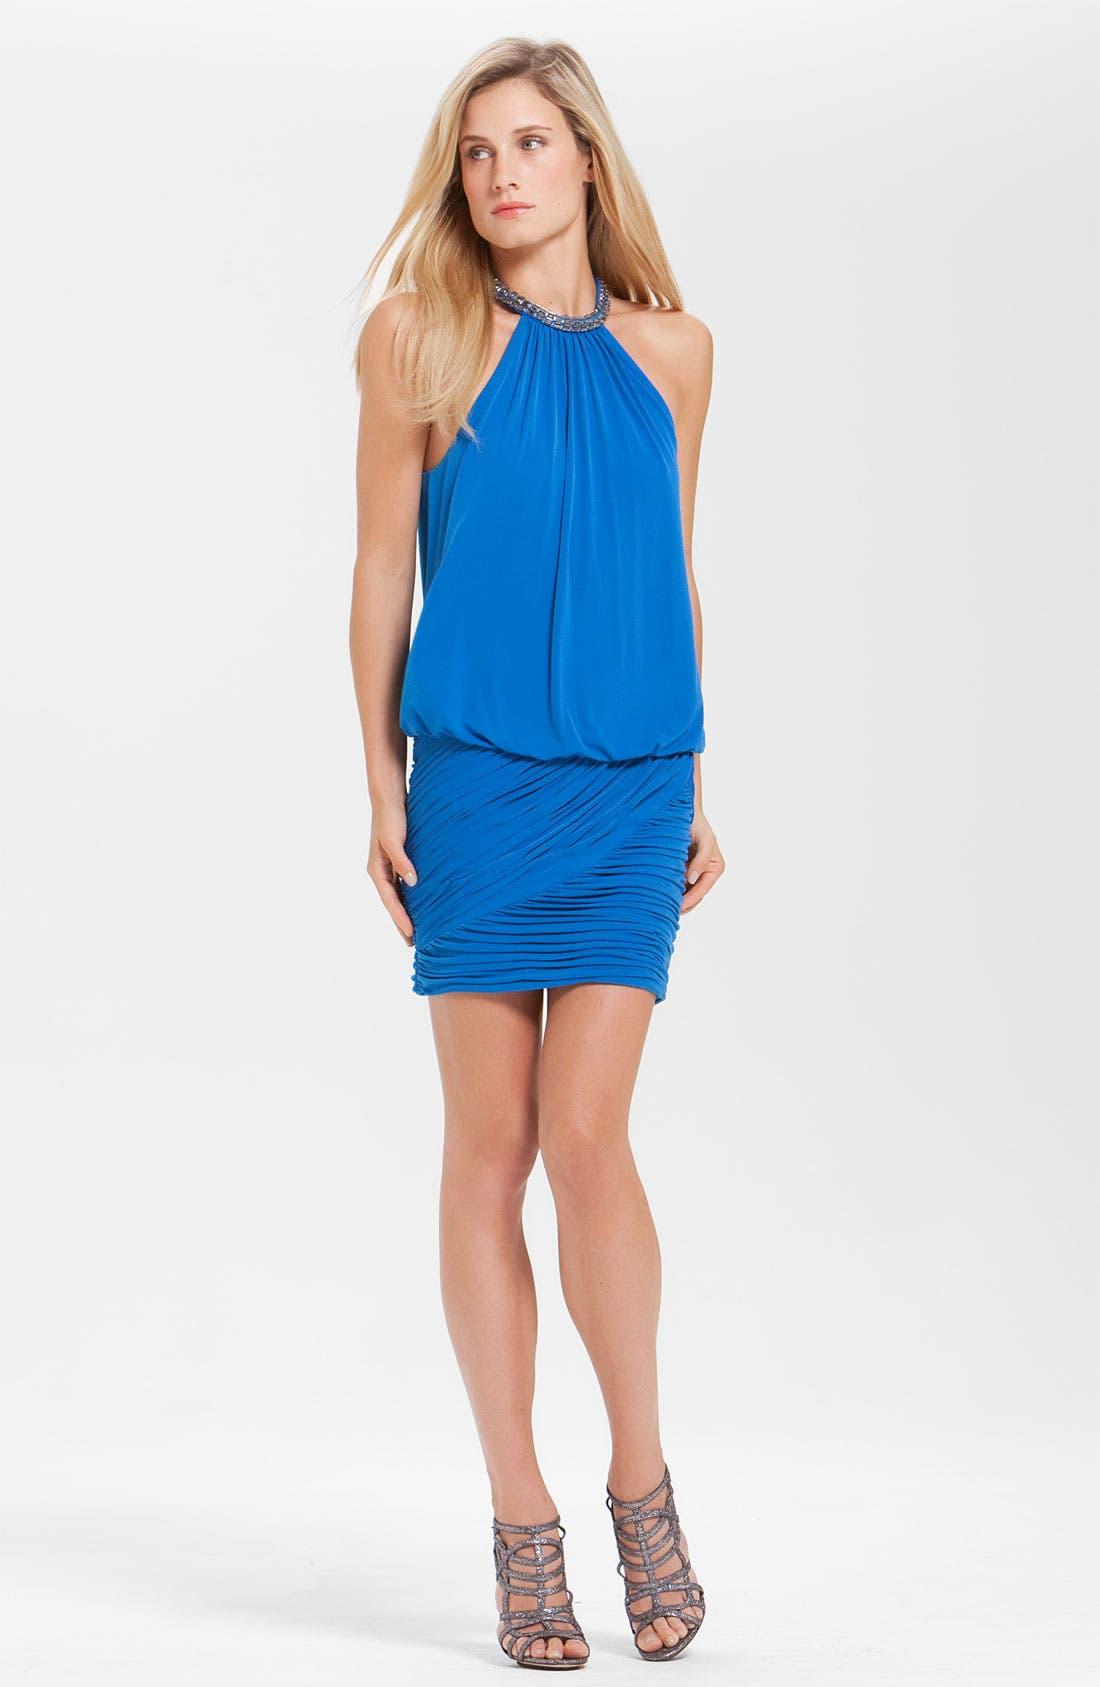 Main Image - Laundry by Shelli Segal Jewel Collar Jersey Blouson Dress